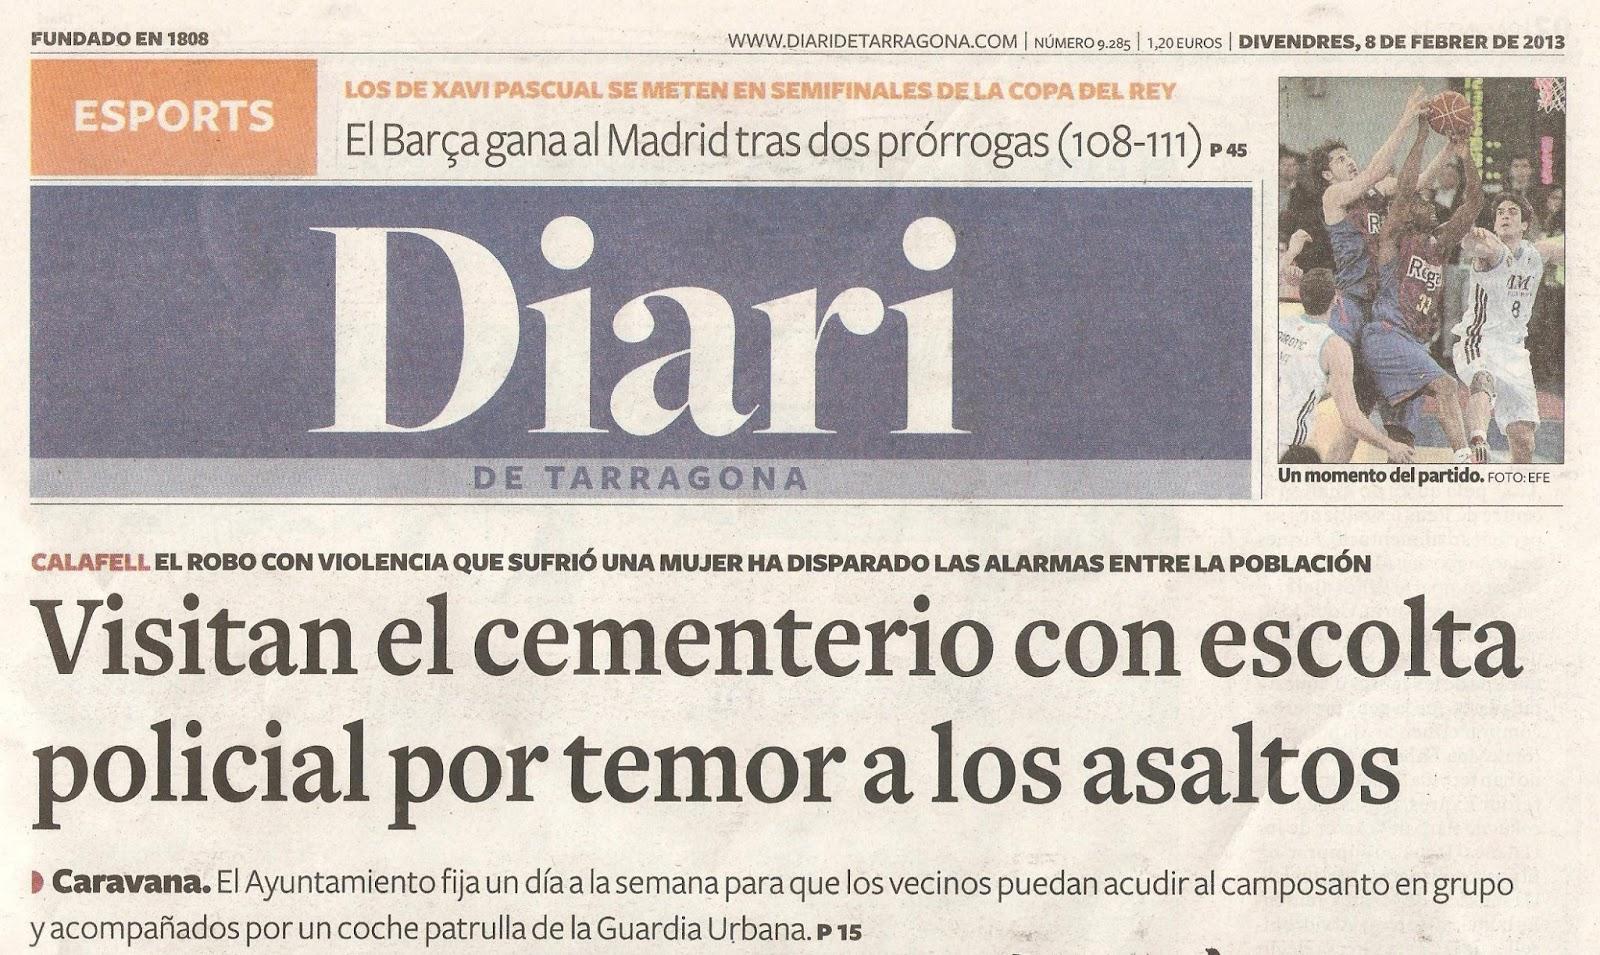 hoy diari: